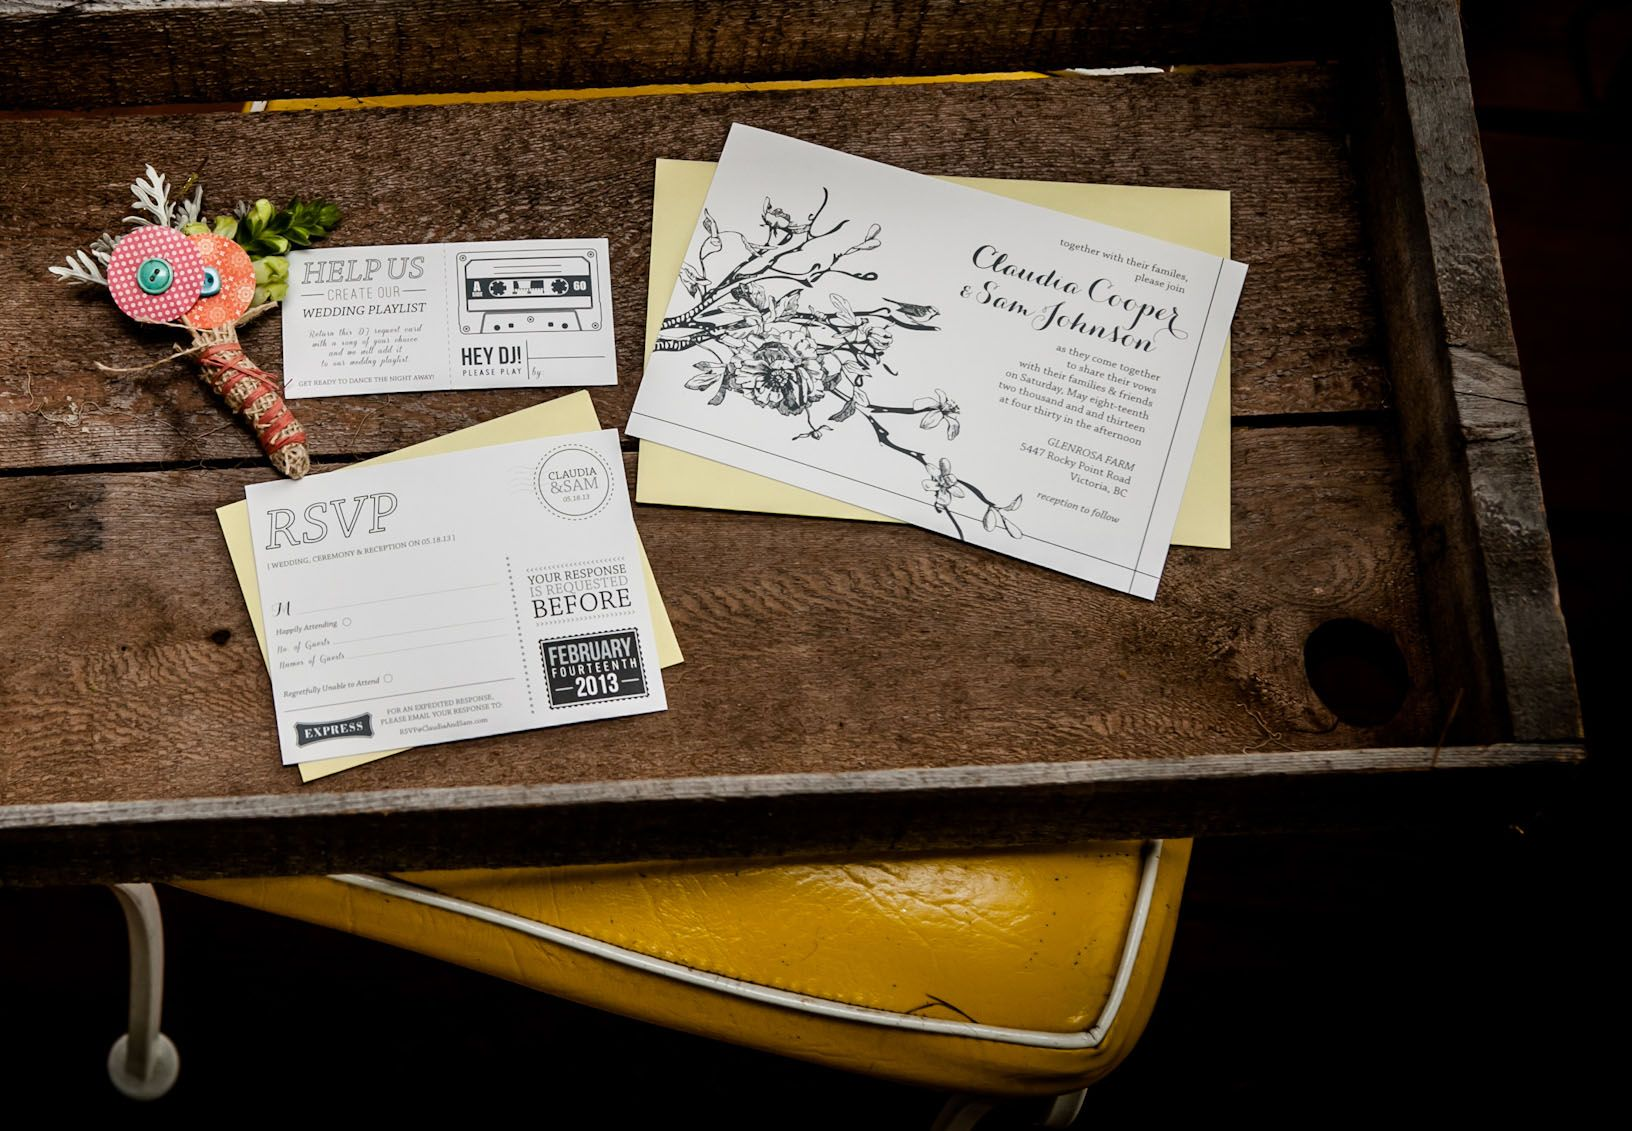 Venue Glenrosa Farm Bed and Breakfast /Photography Lisa